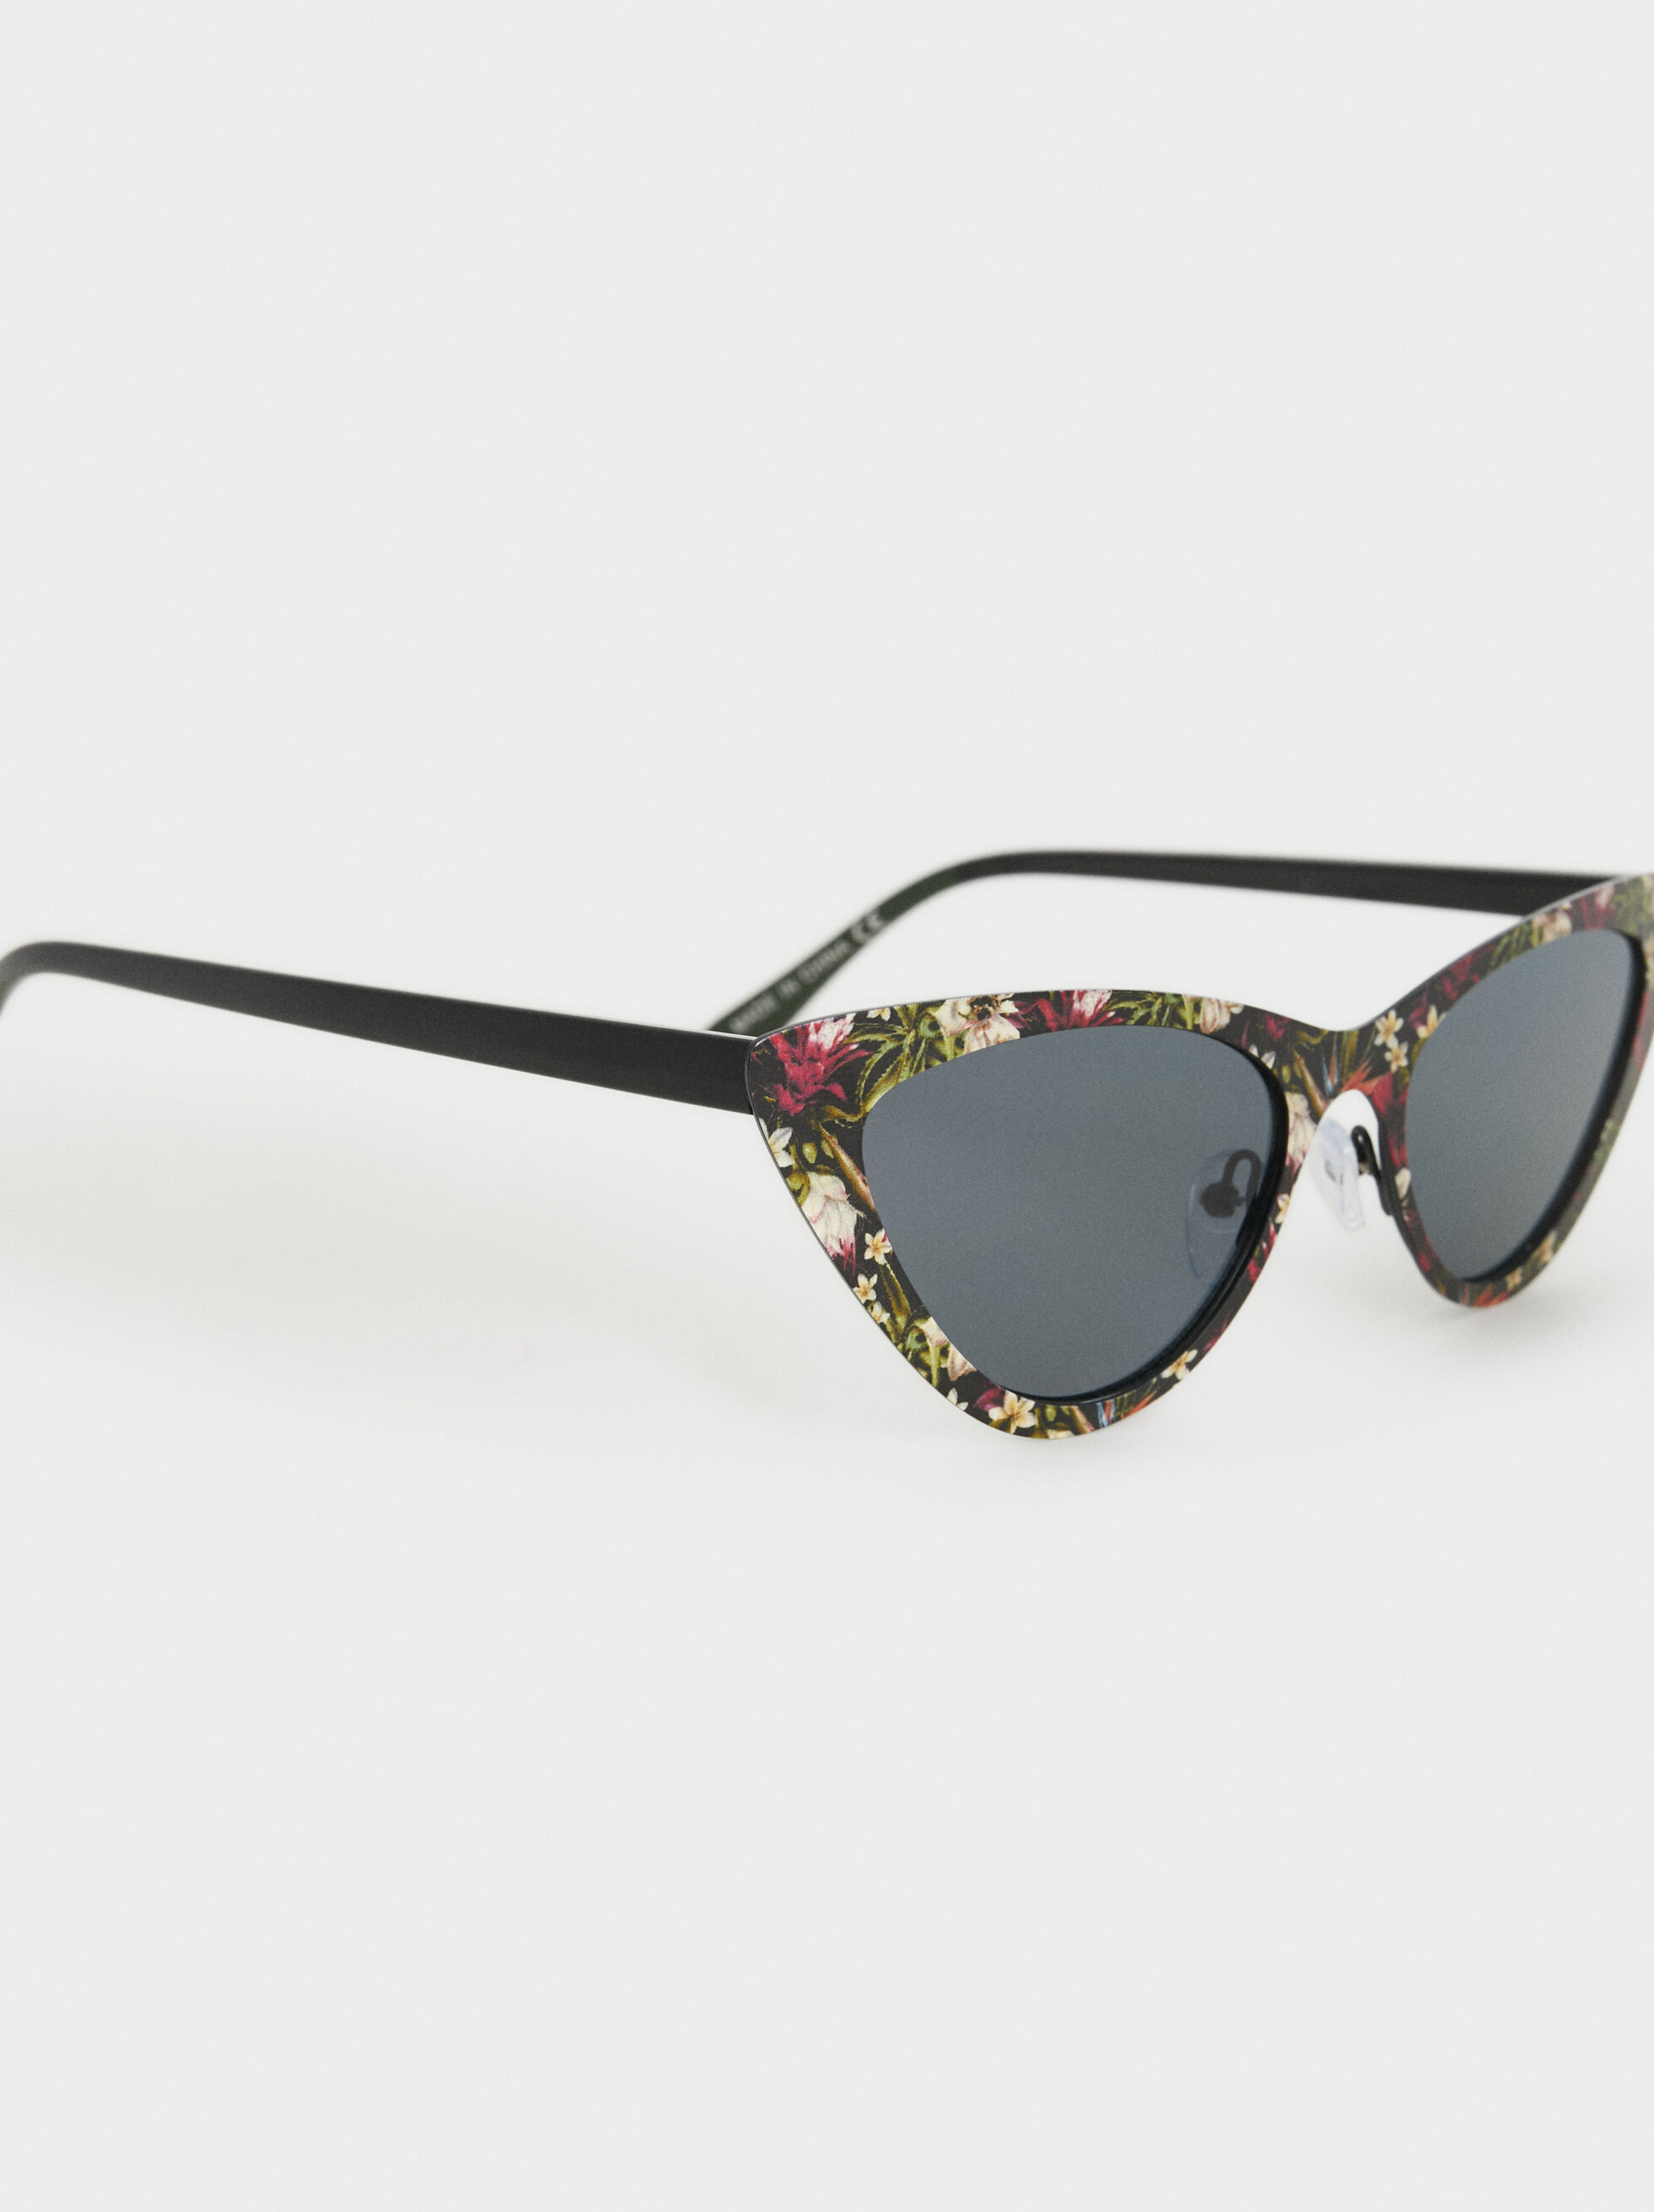 Cat-Eye Sunglasses, Multicolor, hi-res